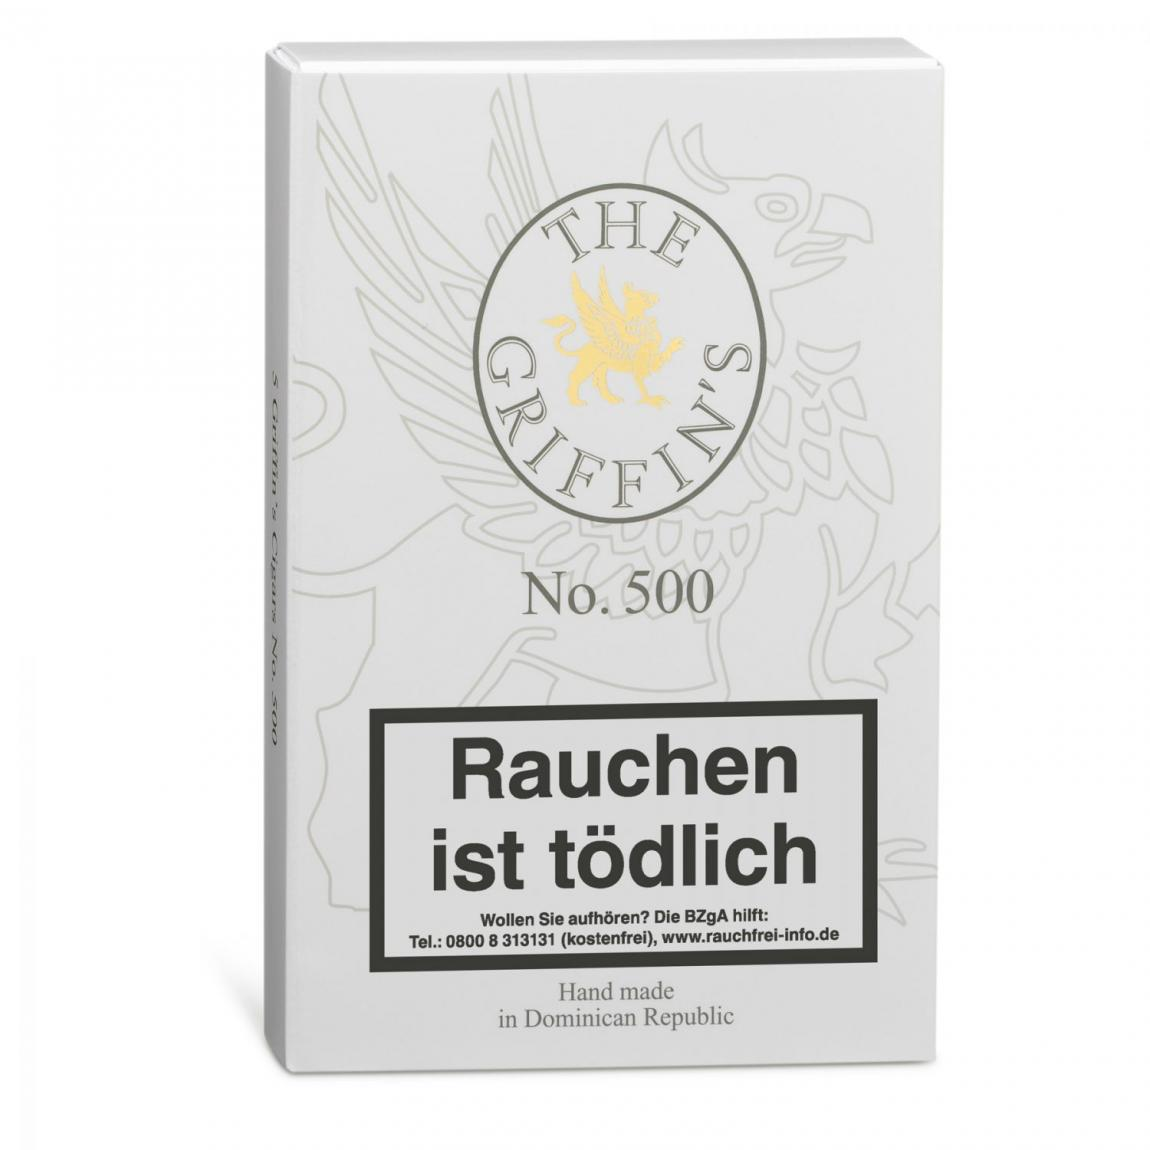 Griffin's No. 500 Tubos 4er Schachtel